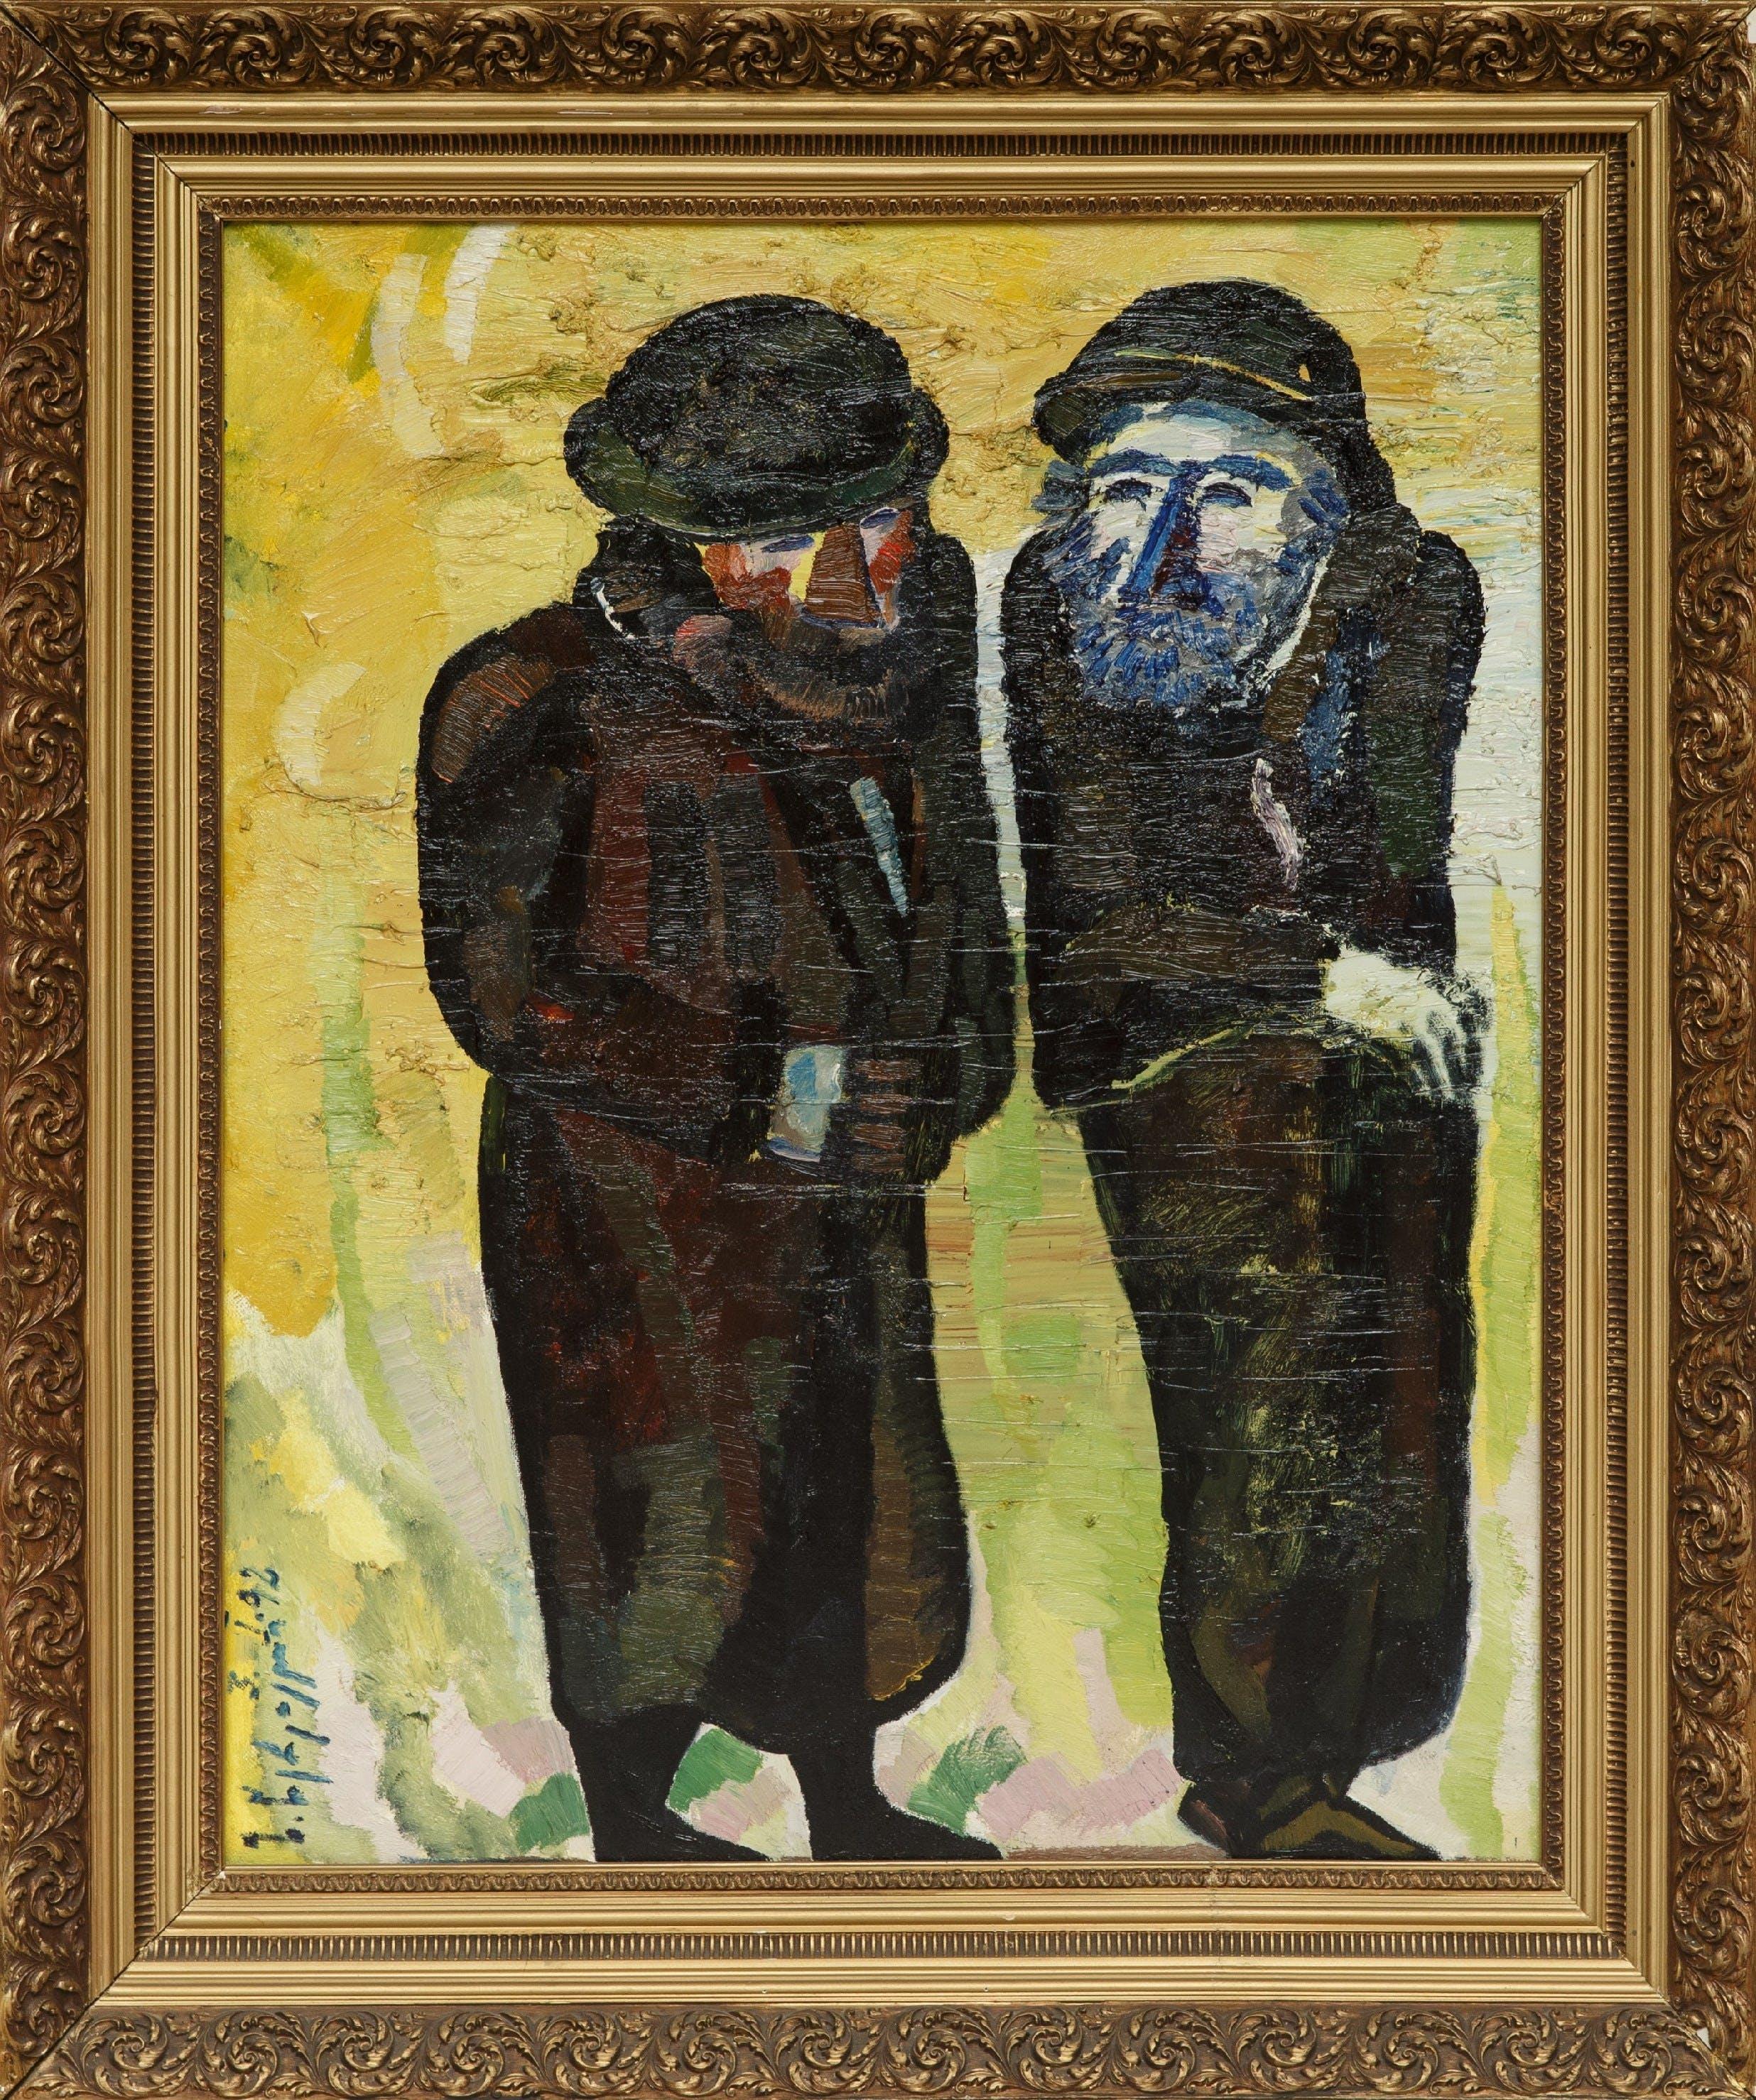 Zurab Tsereteli, Jerusalem, 1995, Oil on canvas